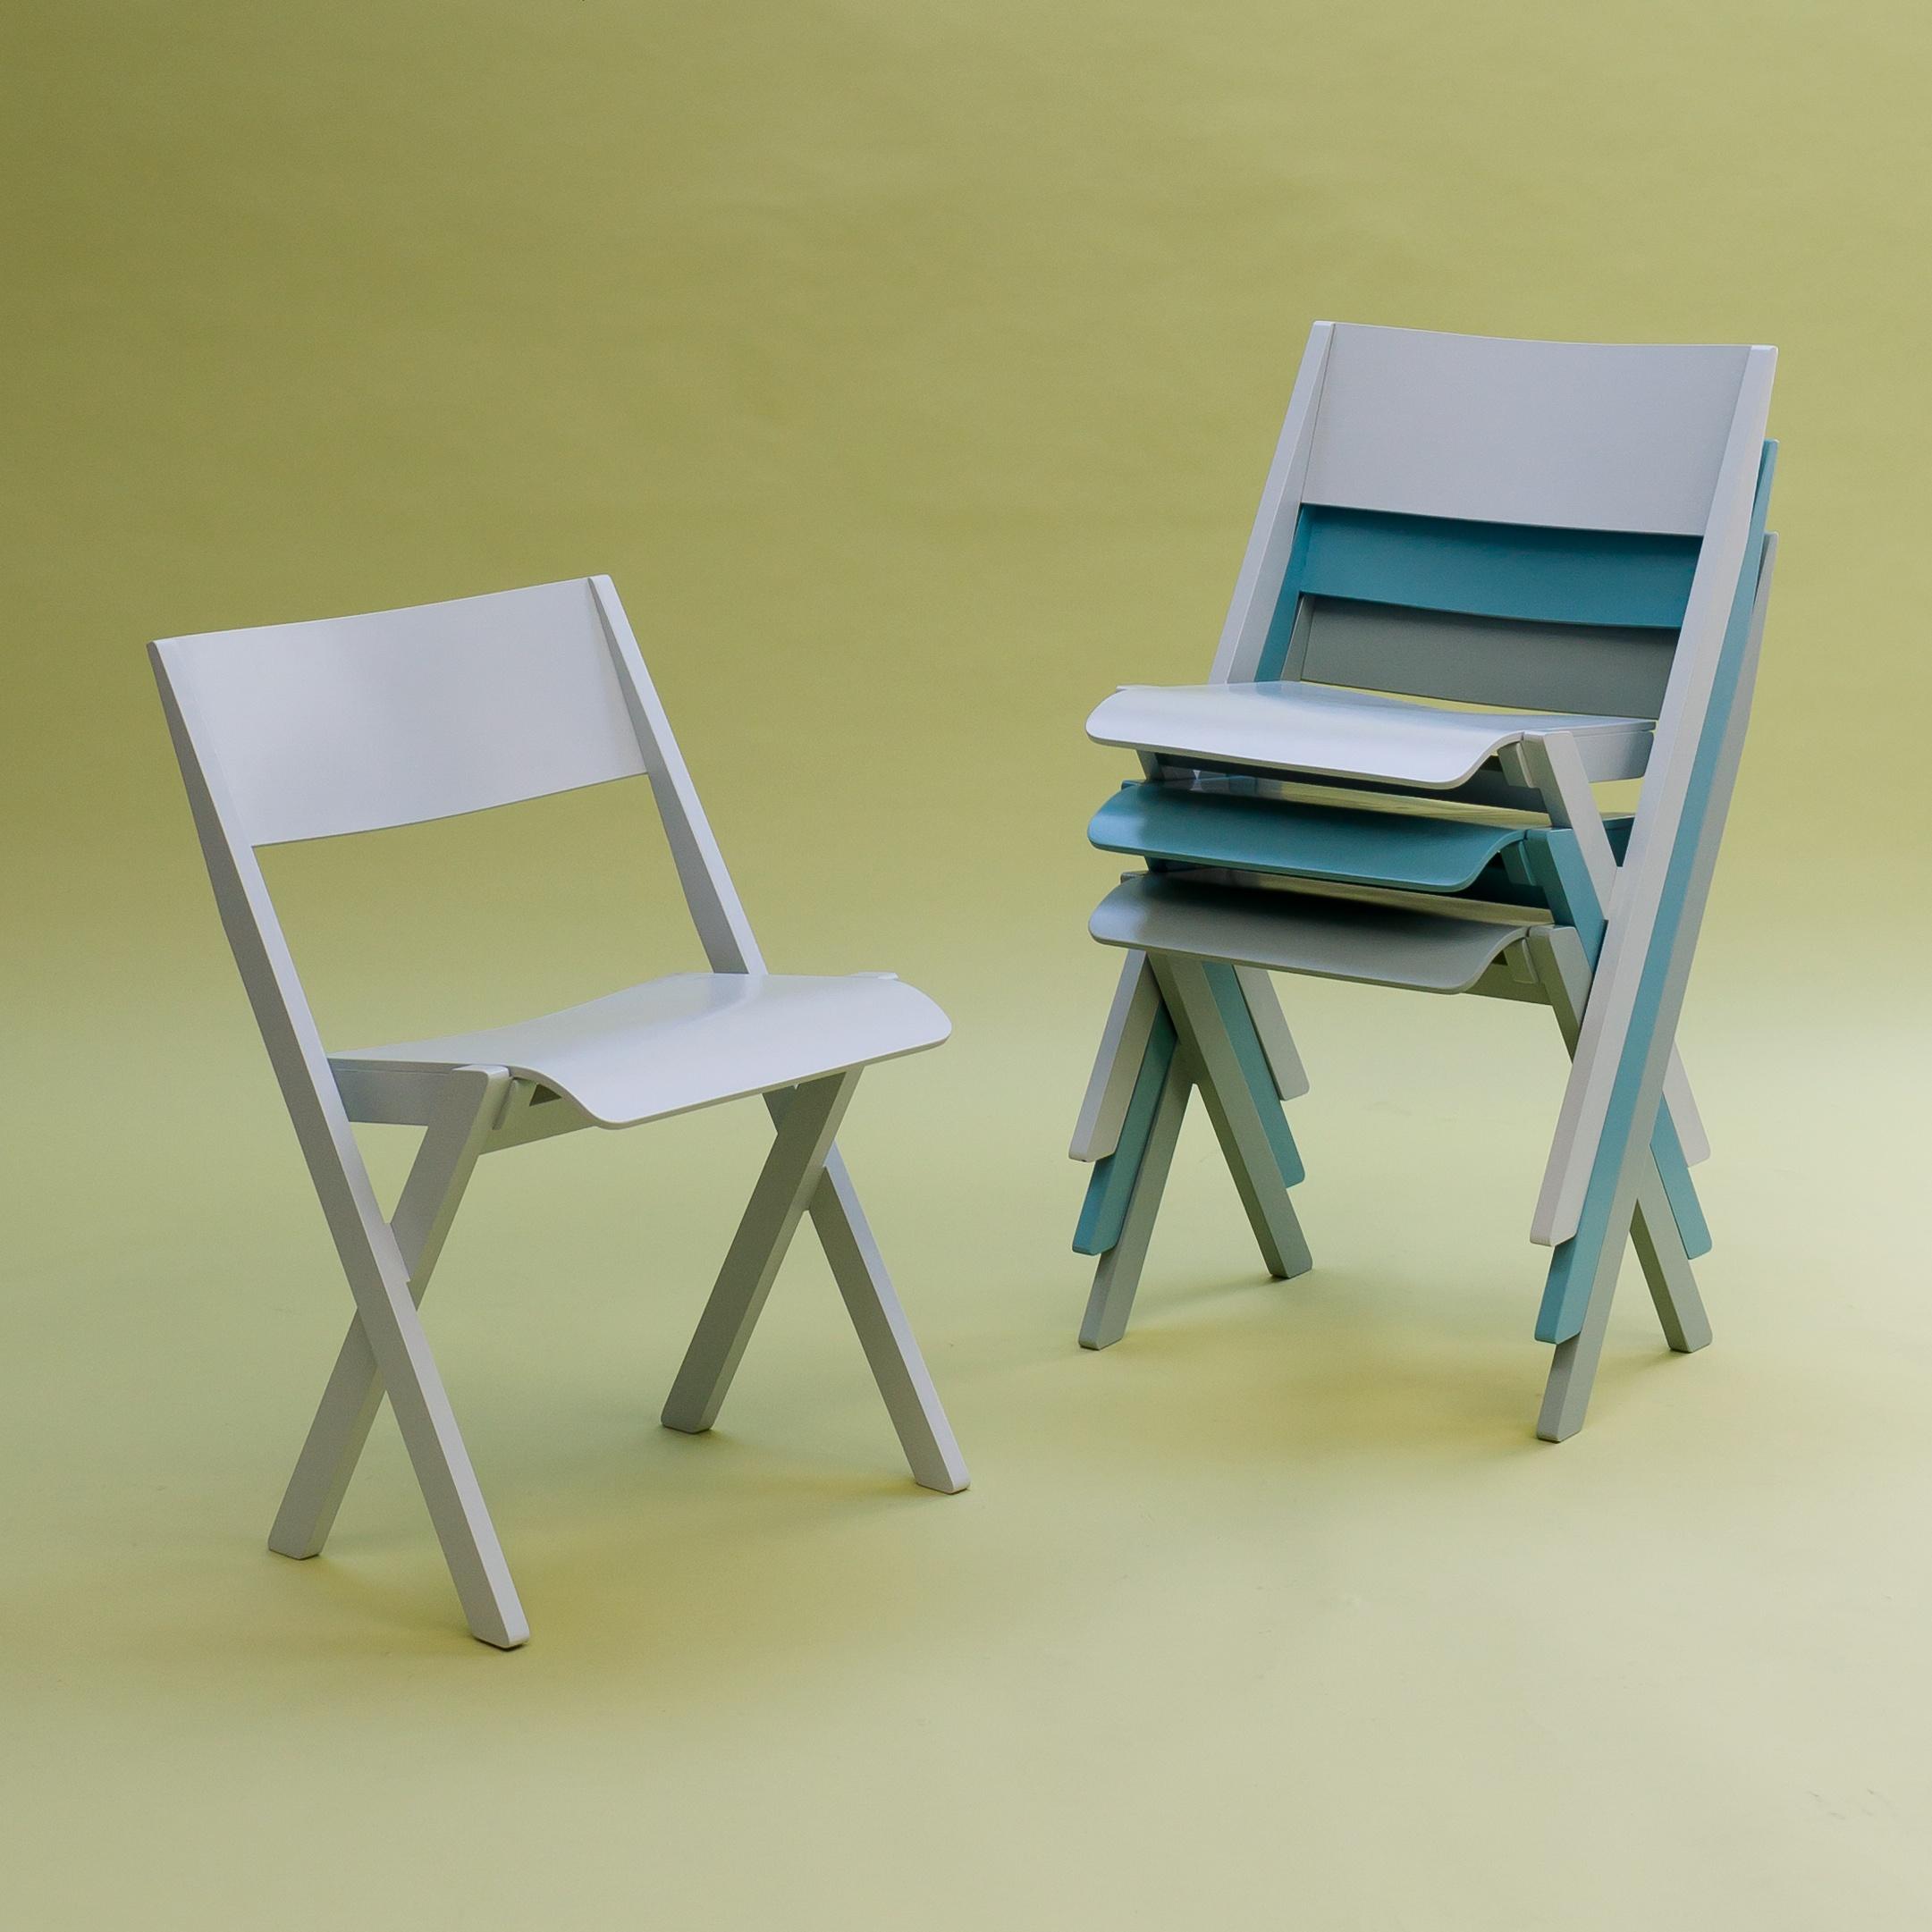 Fogo_chair_&_stack.jpg